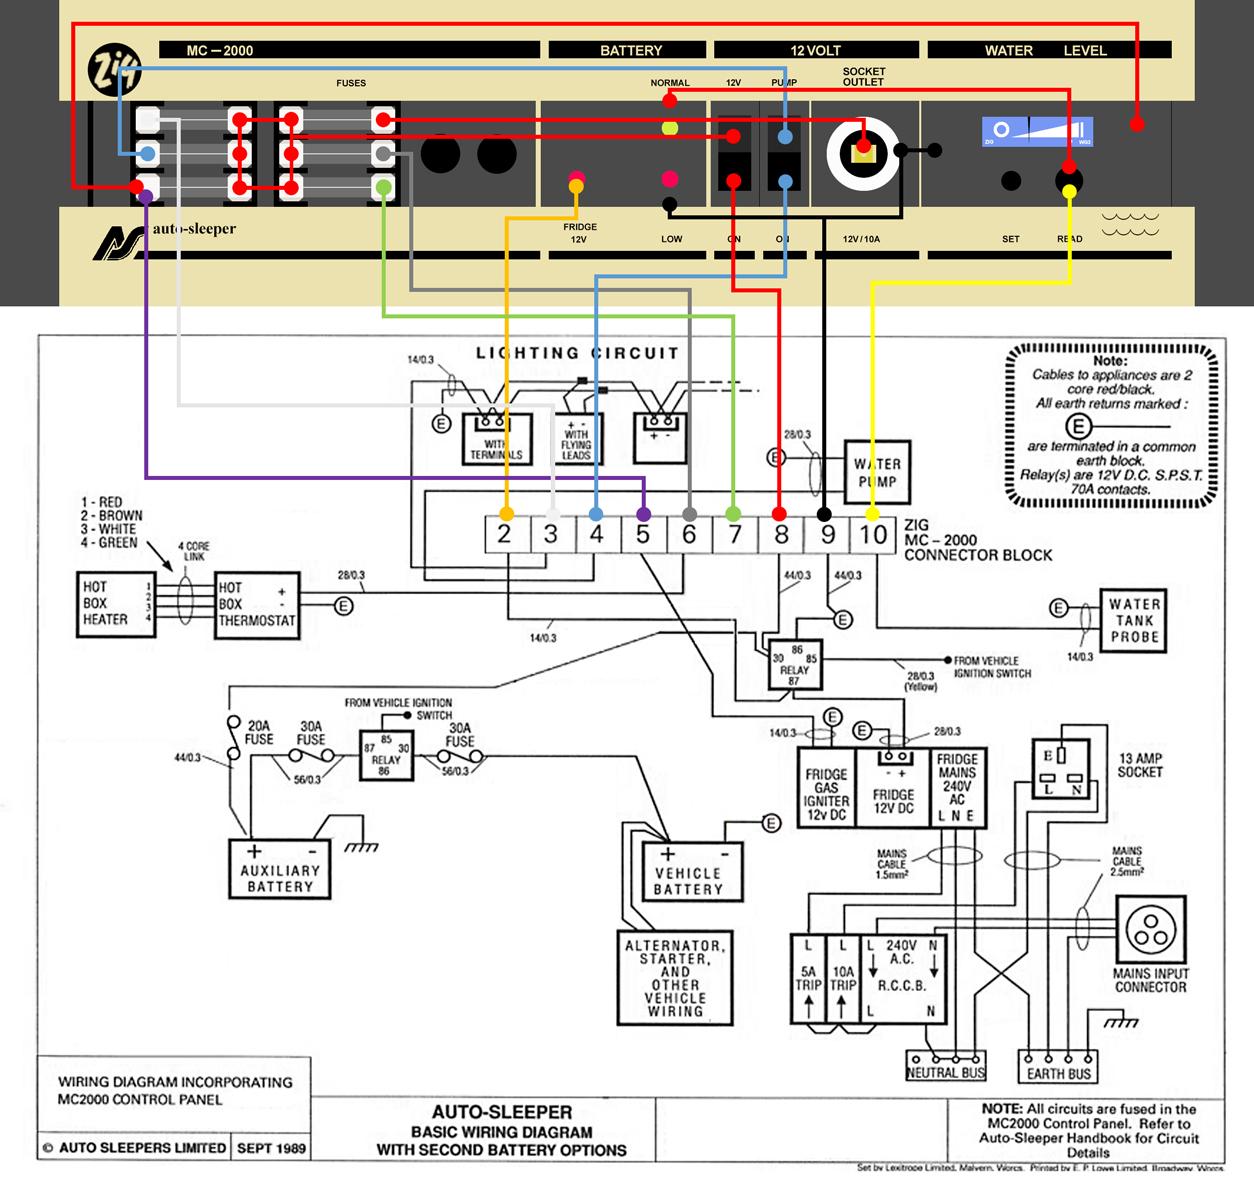 medium resolution of mc wiring diagram wiring diagram expert wiring diagram programs mc